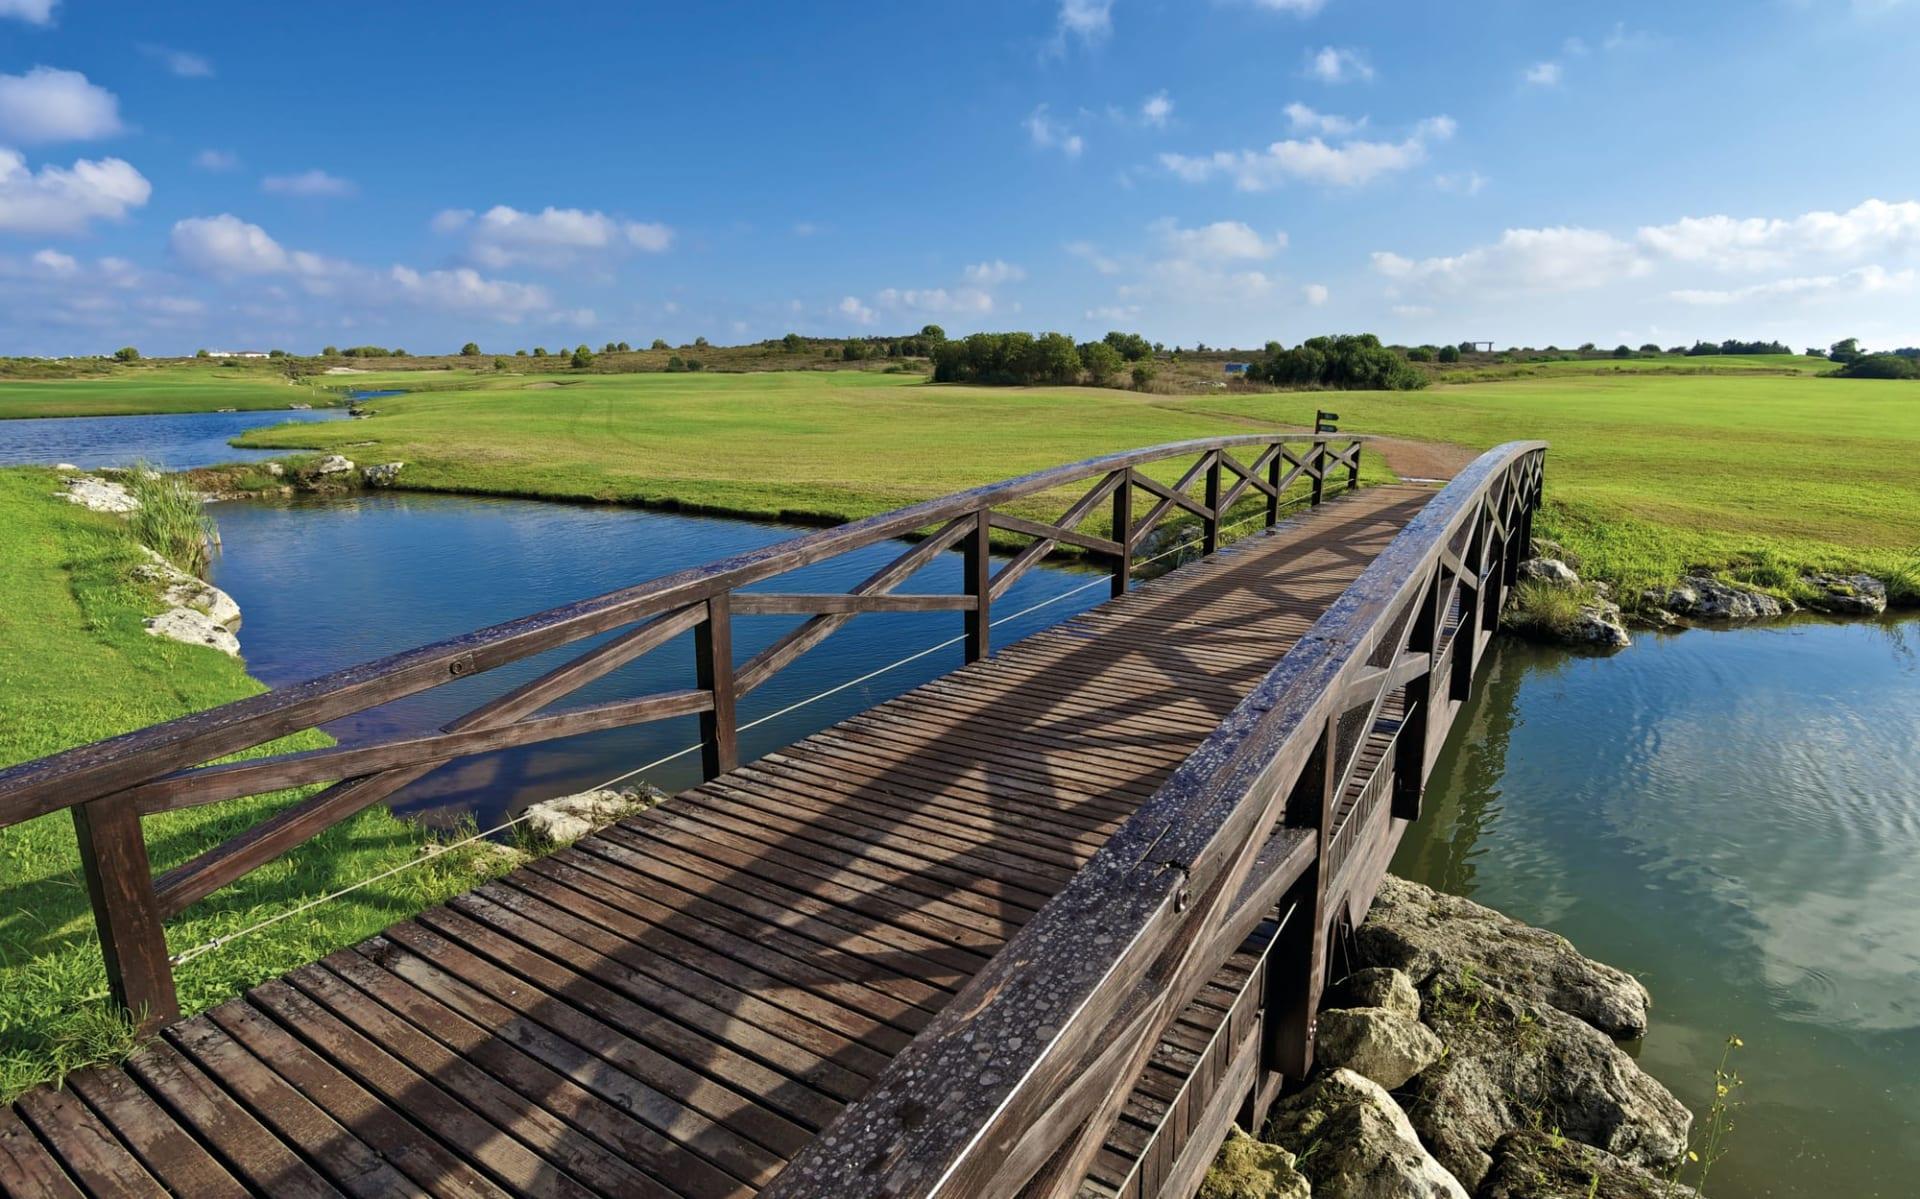 Acaya Golf Resort in Brindisi: Acaya-Golf-Resort_Golf_Bridge_IAGTO